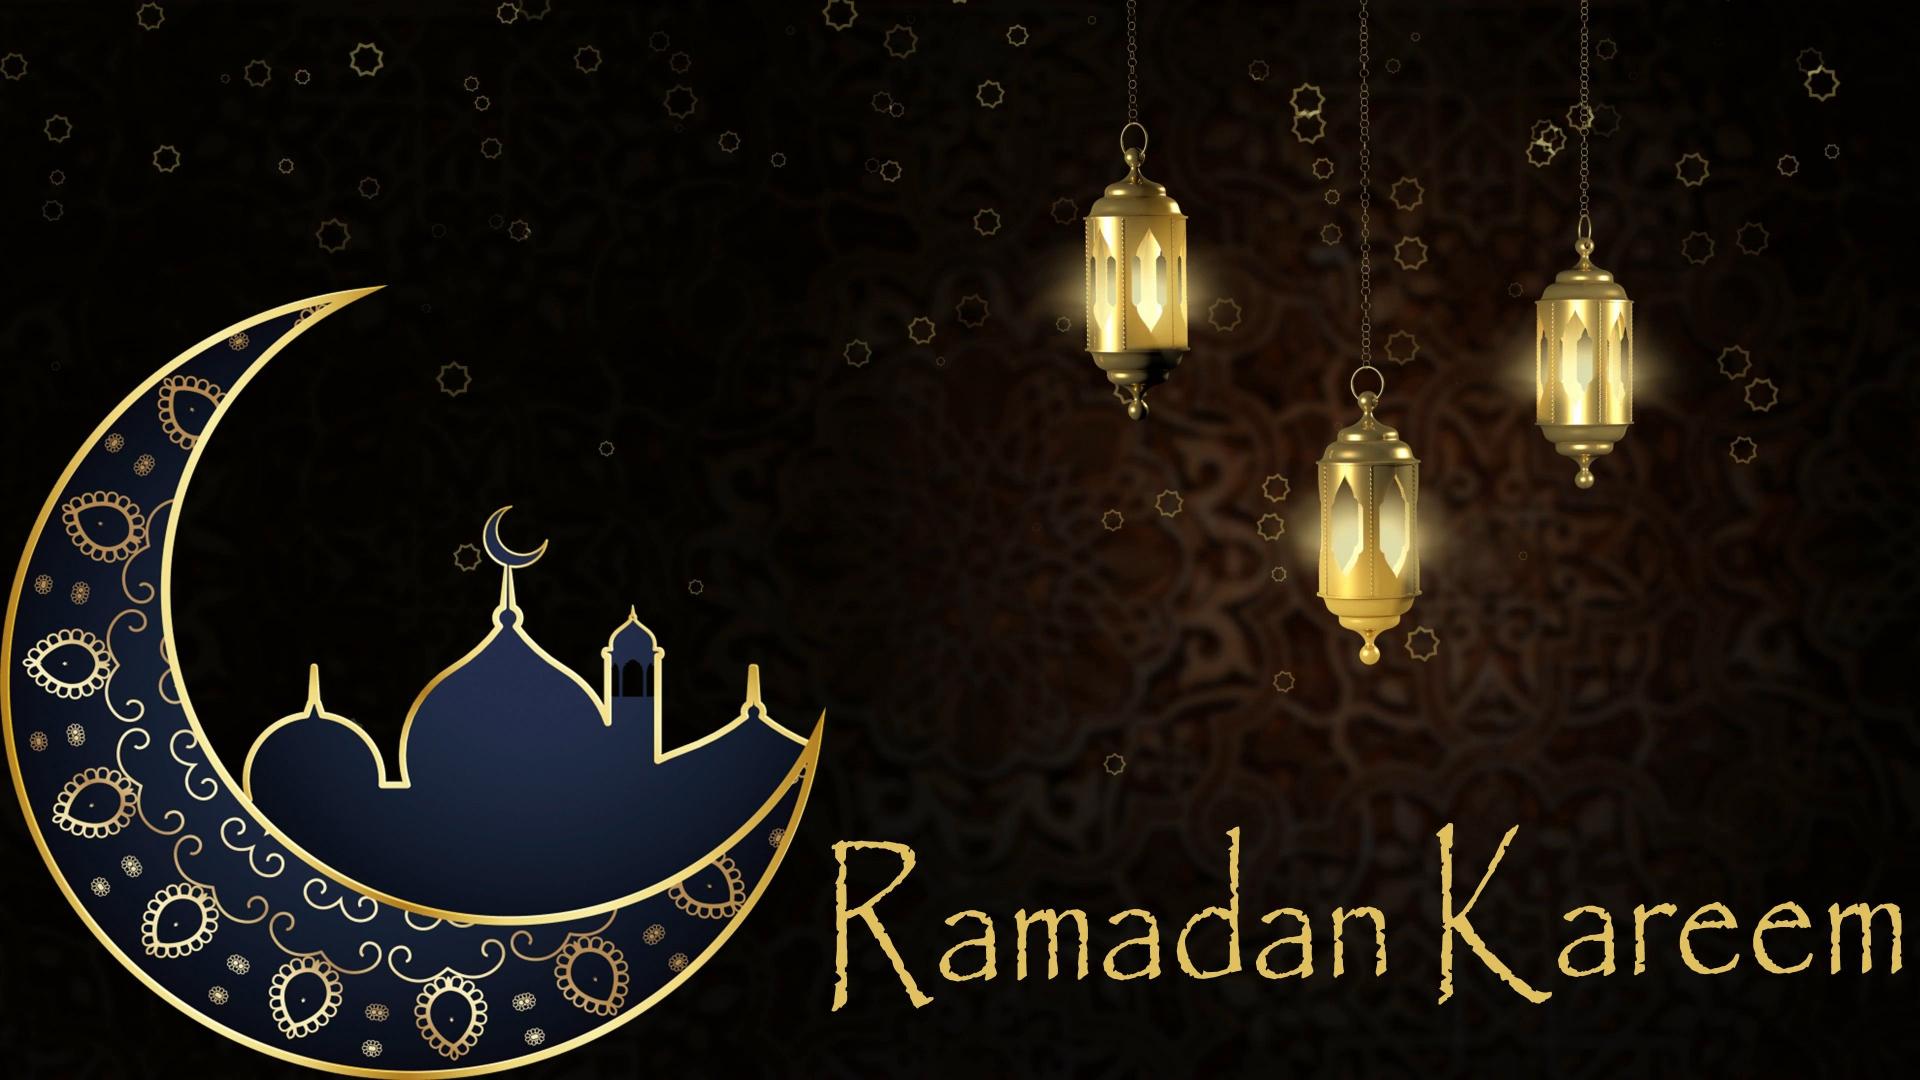 happy-ramadan-ramzan-kareem-islamic-hd-images-wallpapers-1920×1080